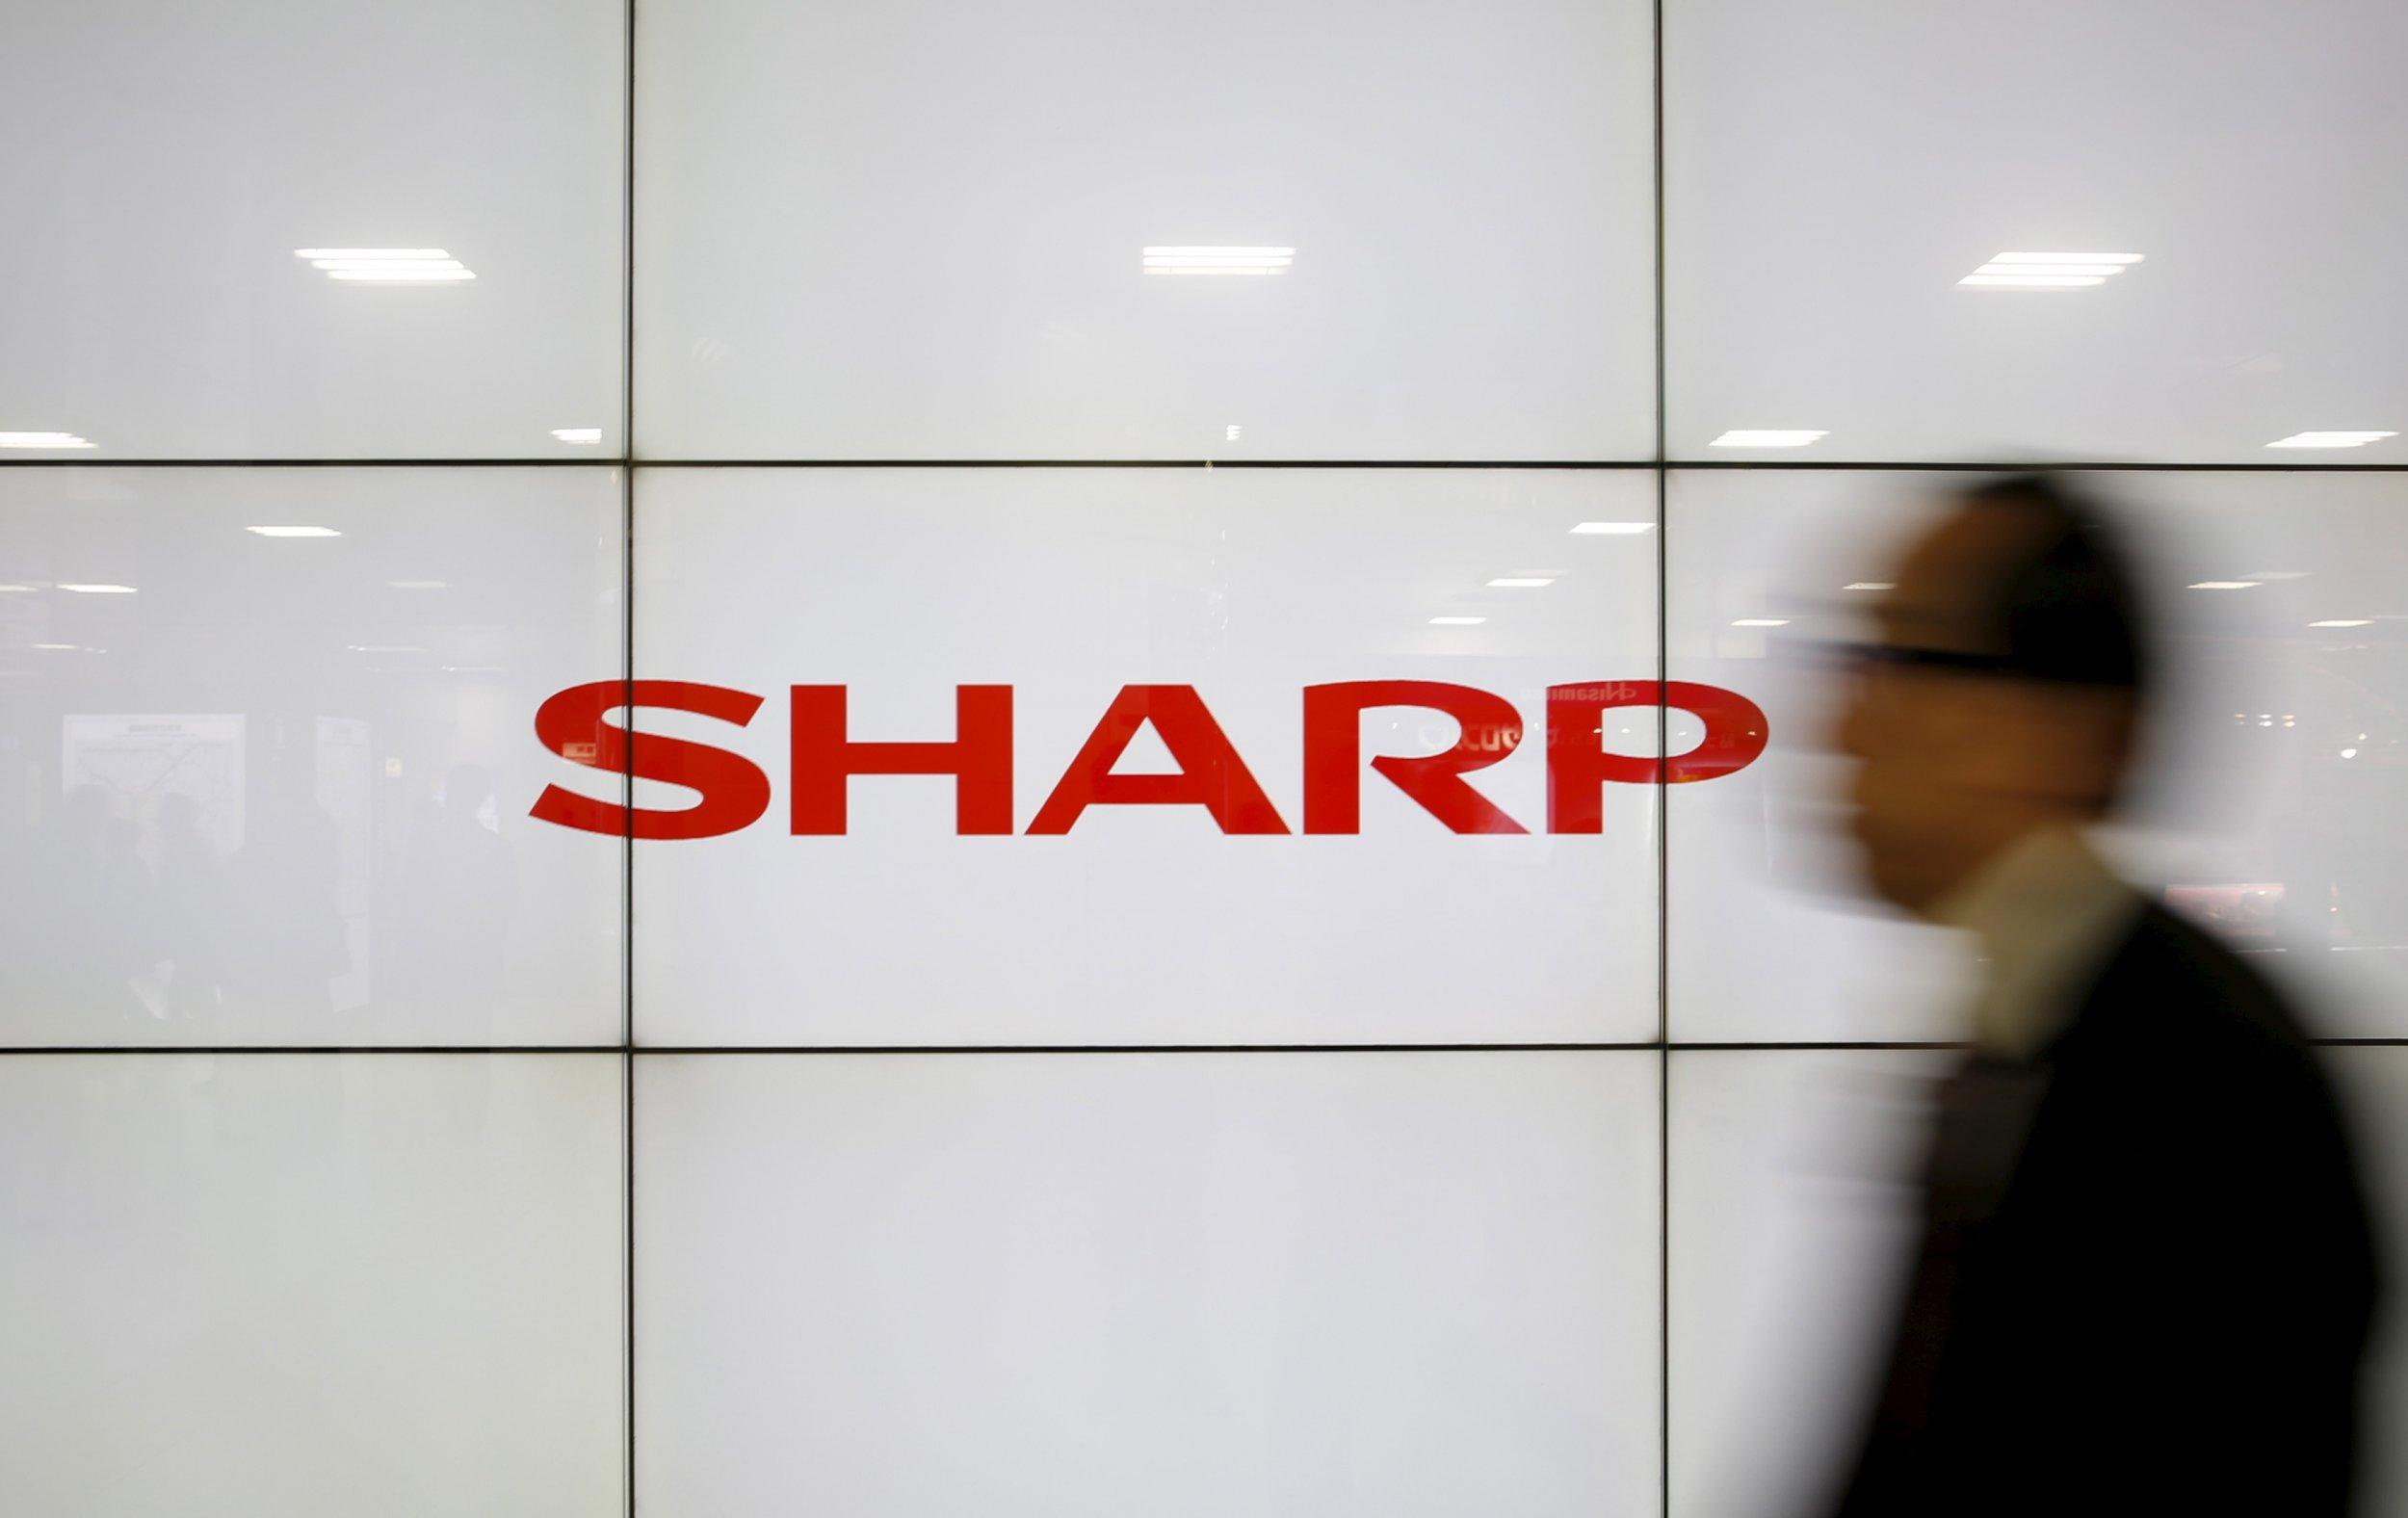 Sharp foxconn deal delayed postponed